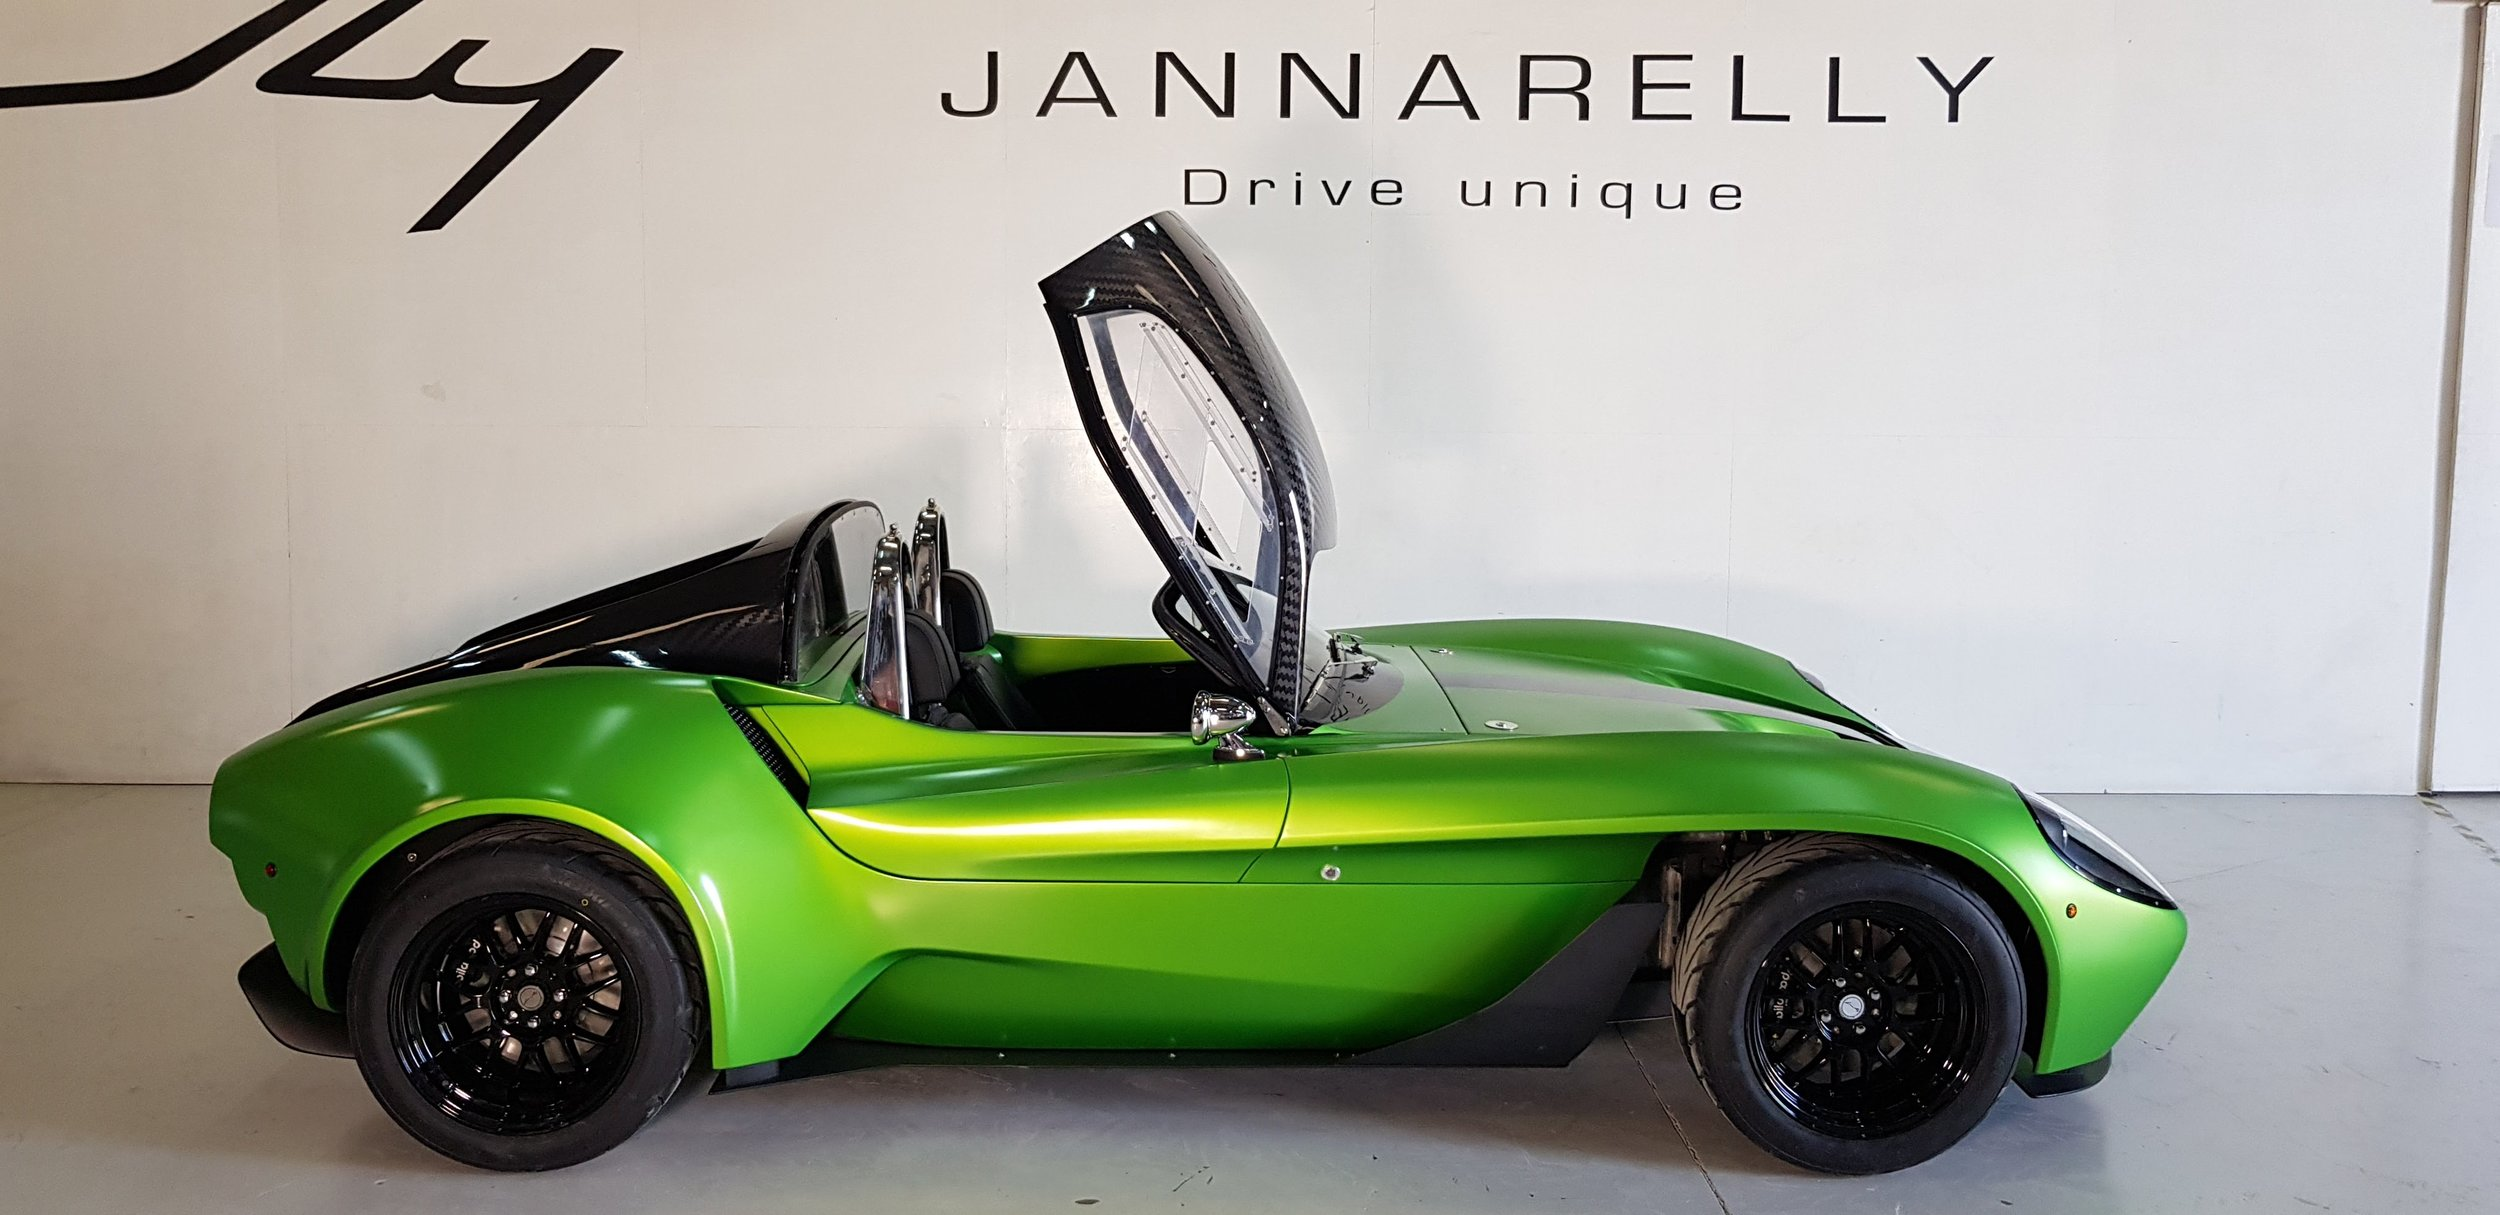 Jannarelly-France-Design-13.jpg